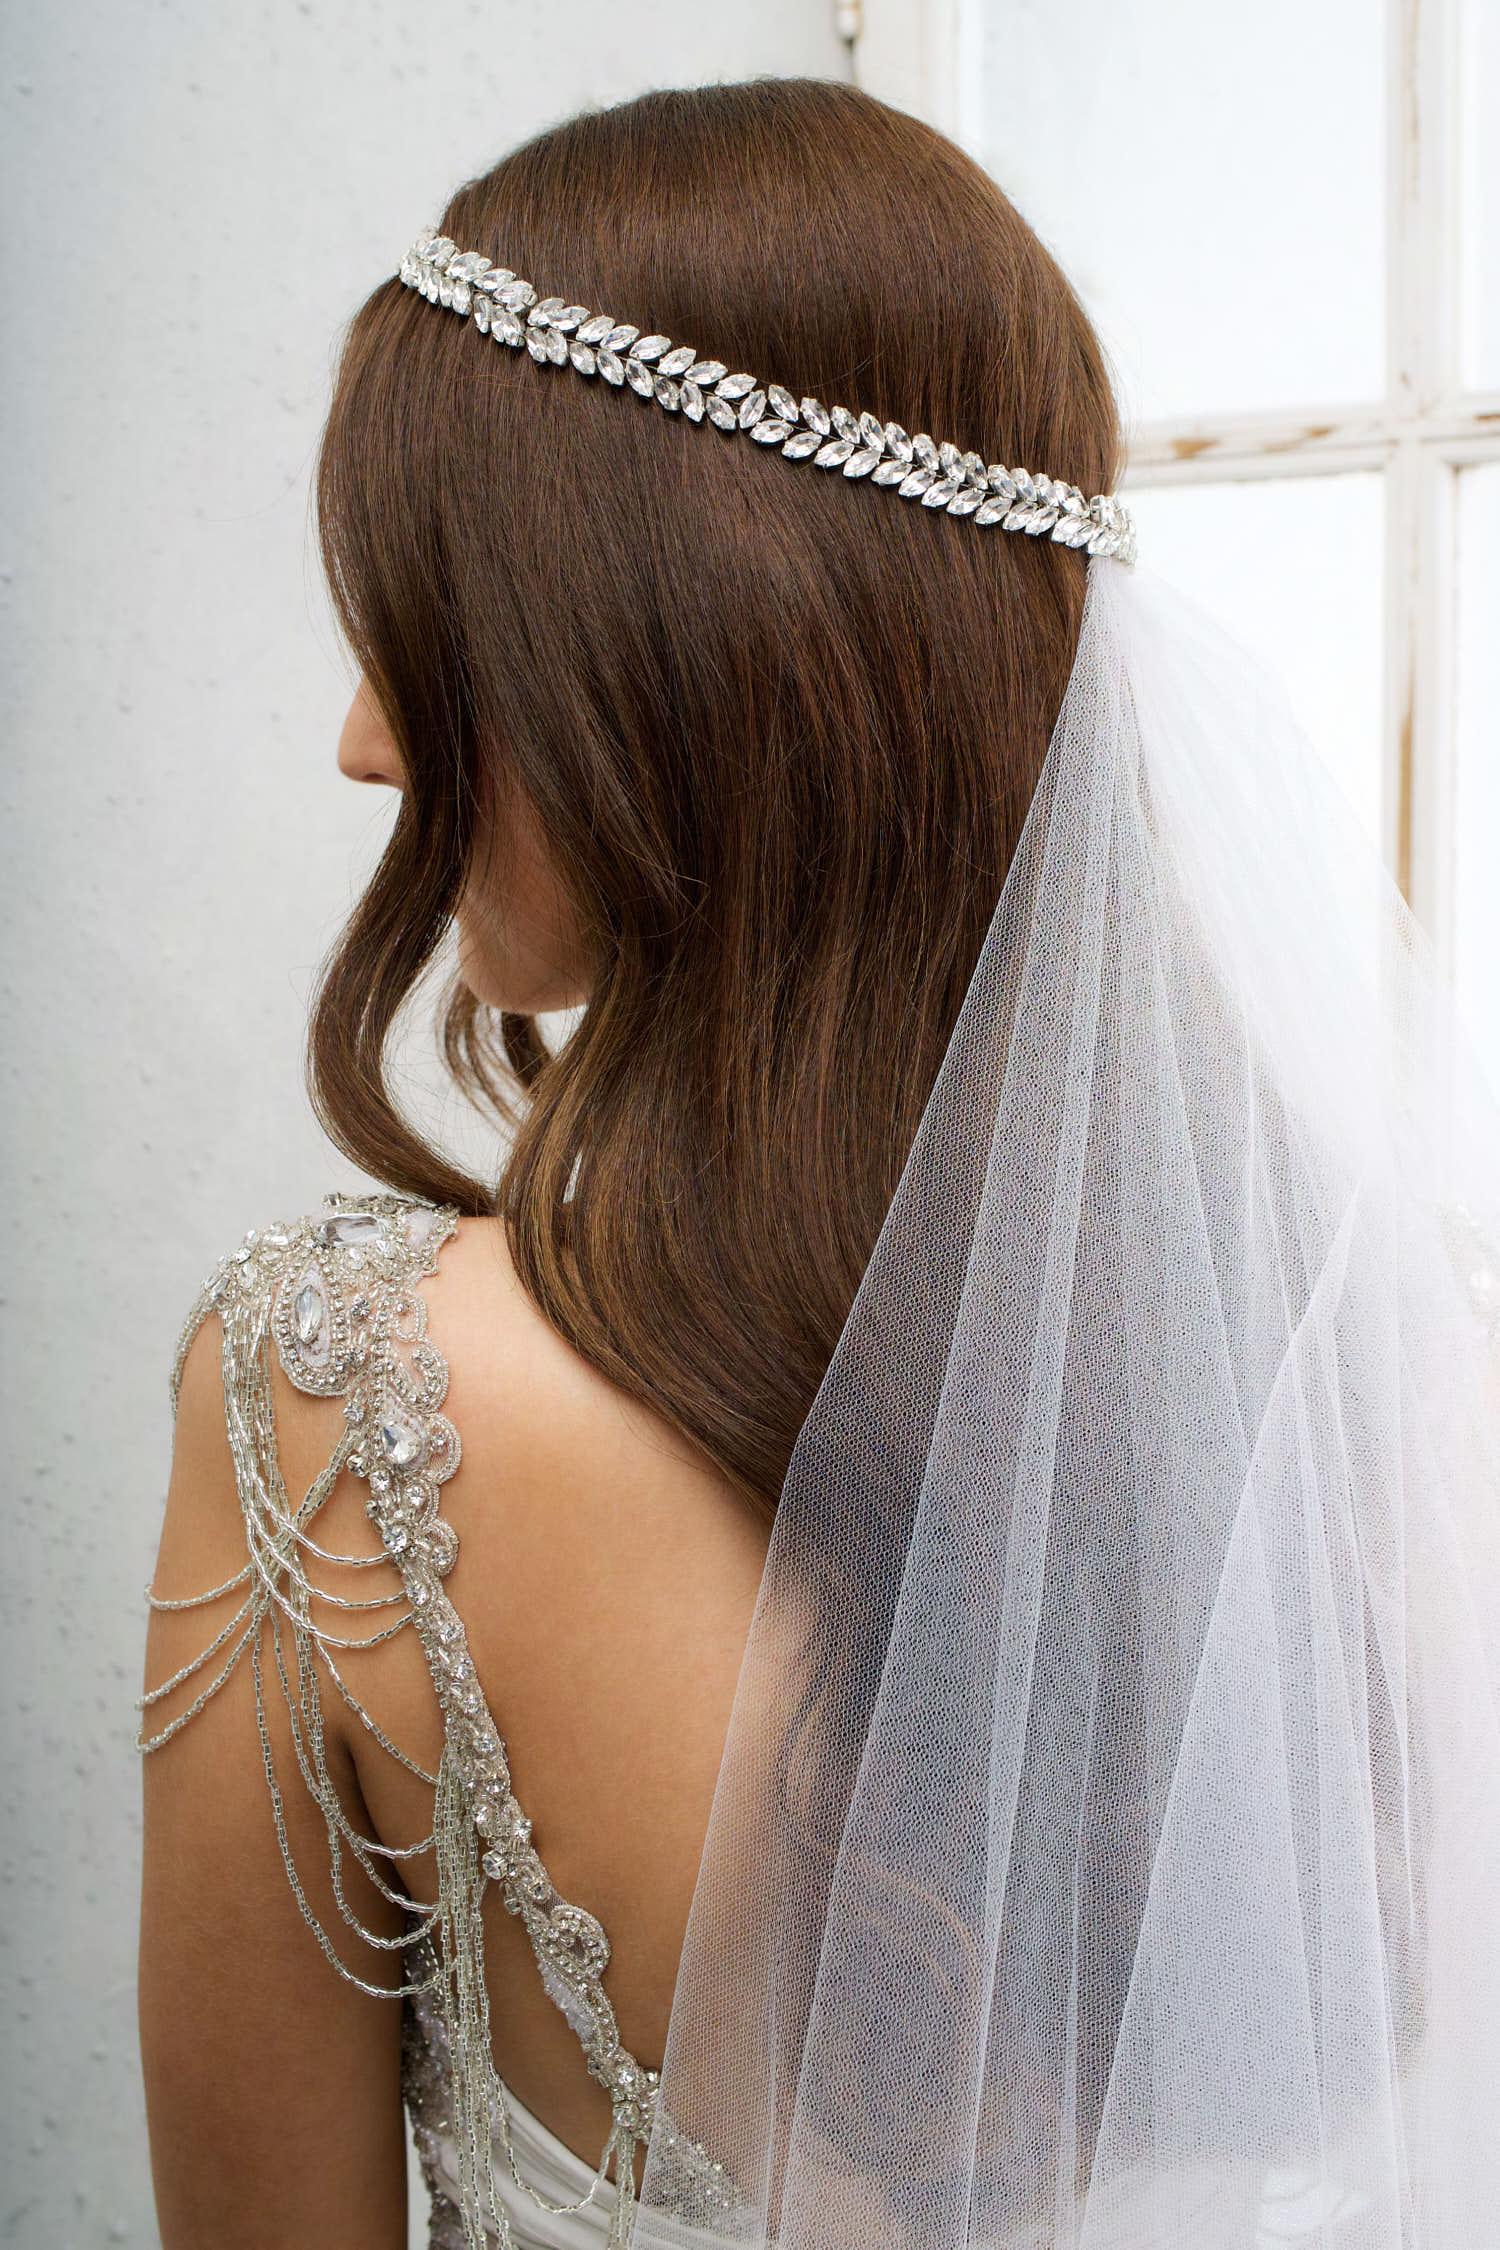 The Phoenix Headpiece worn with the Zara Veil (Chapel Length, No Blusher)